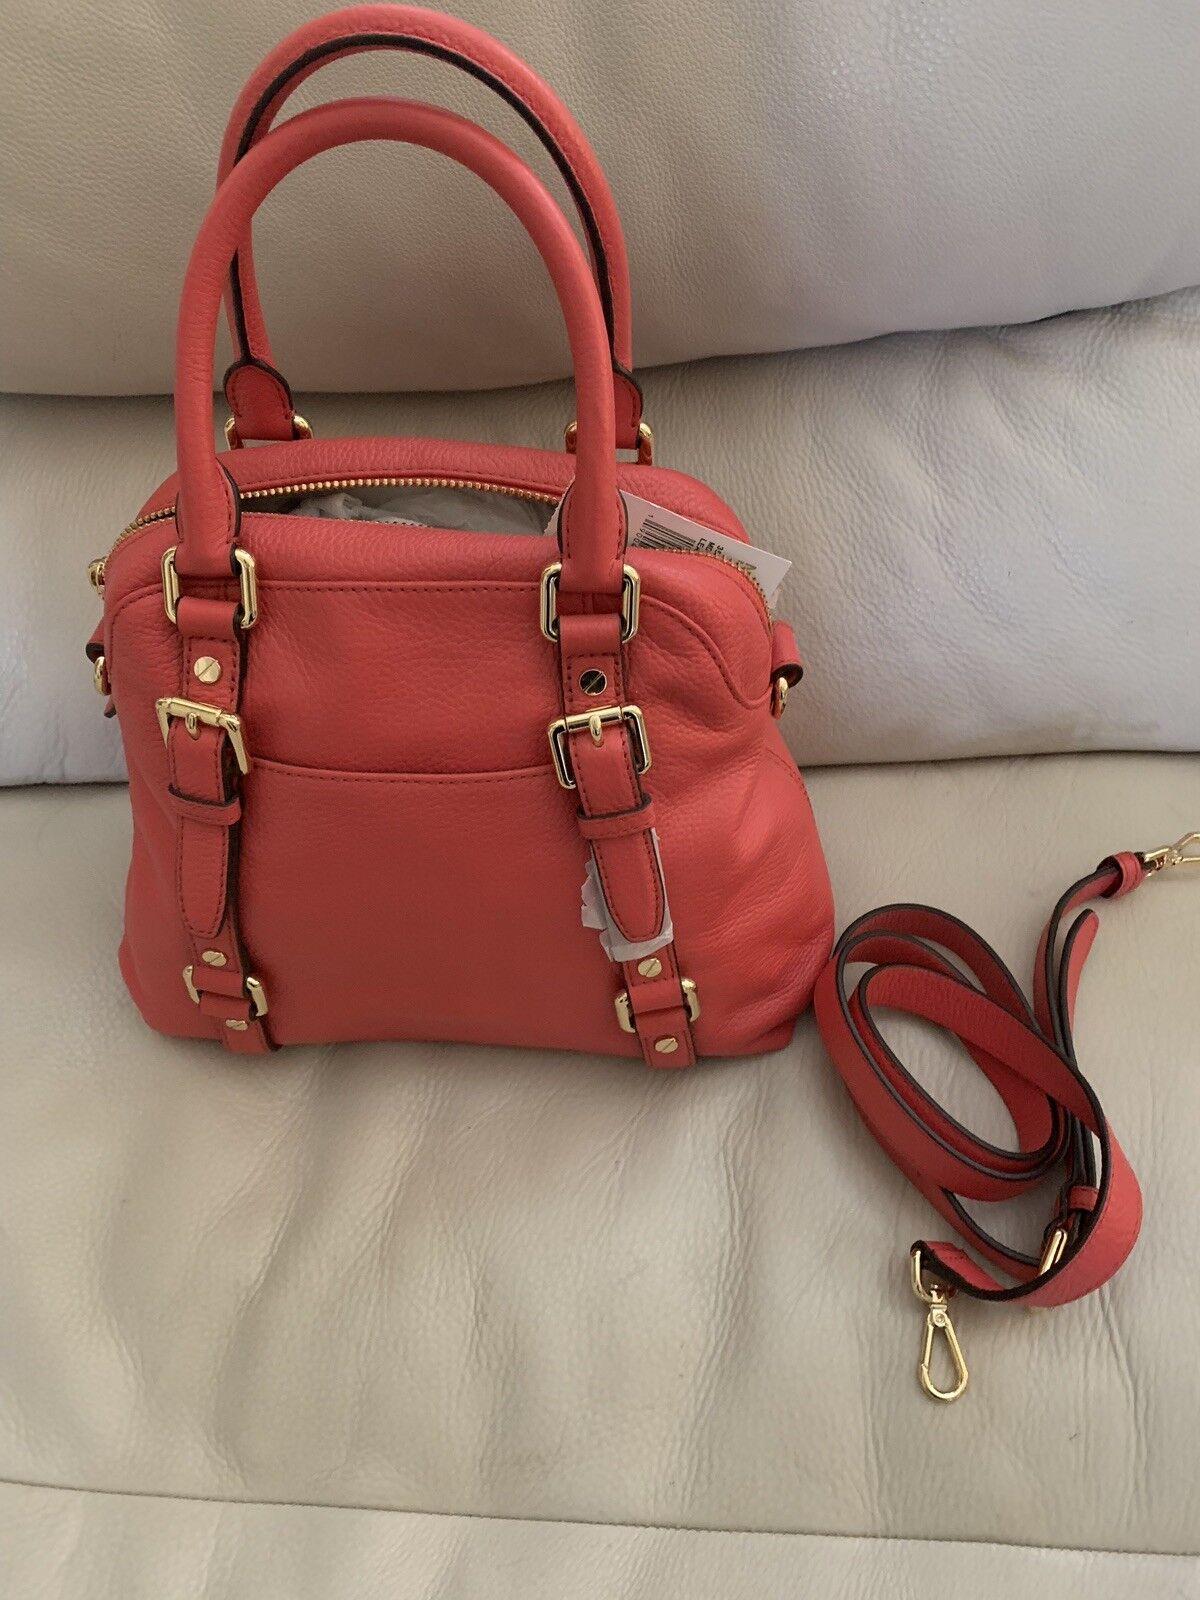 75296b8c77 Michael Kors Bedford MD Bowling Leather Satchel Handbag Watermelon for sale  online